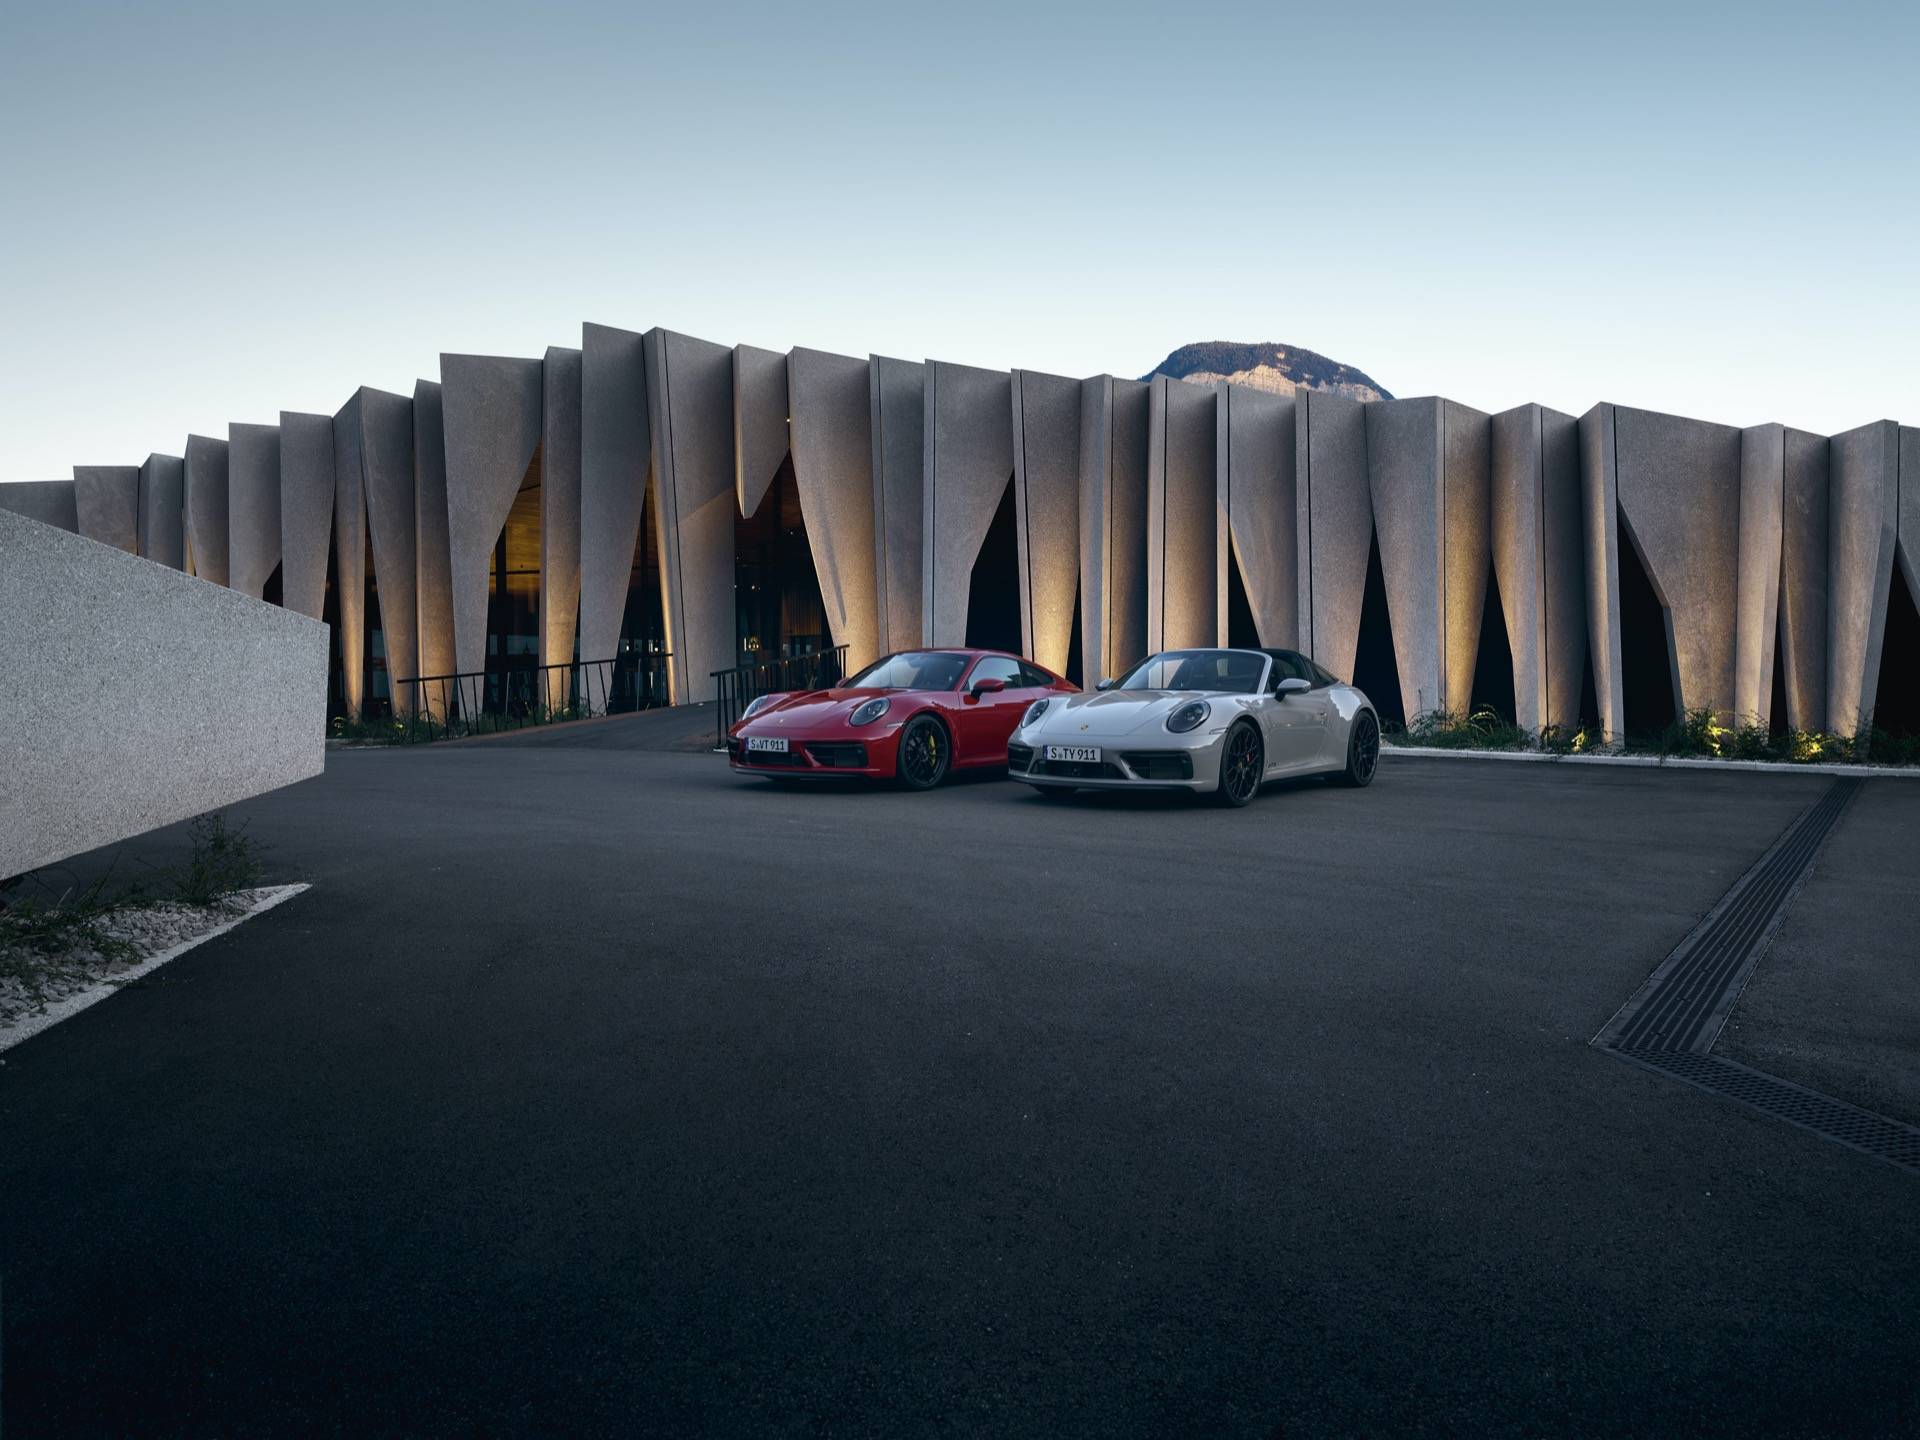 Porsche 911 Gts 7